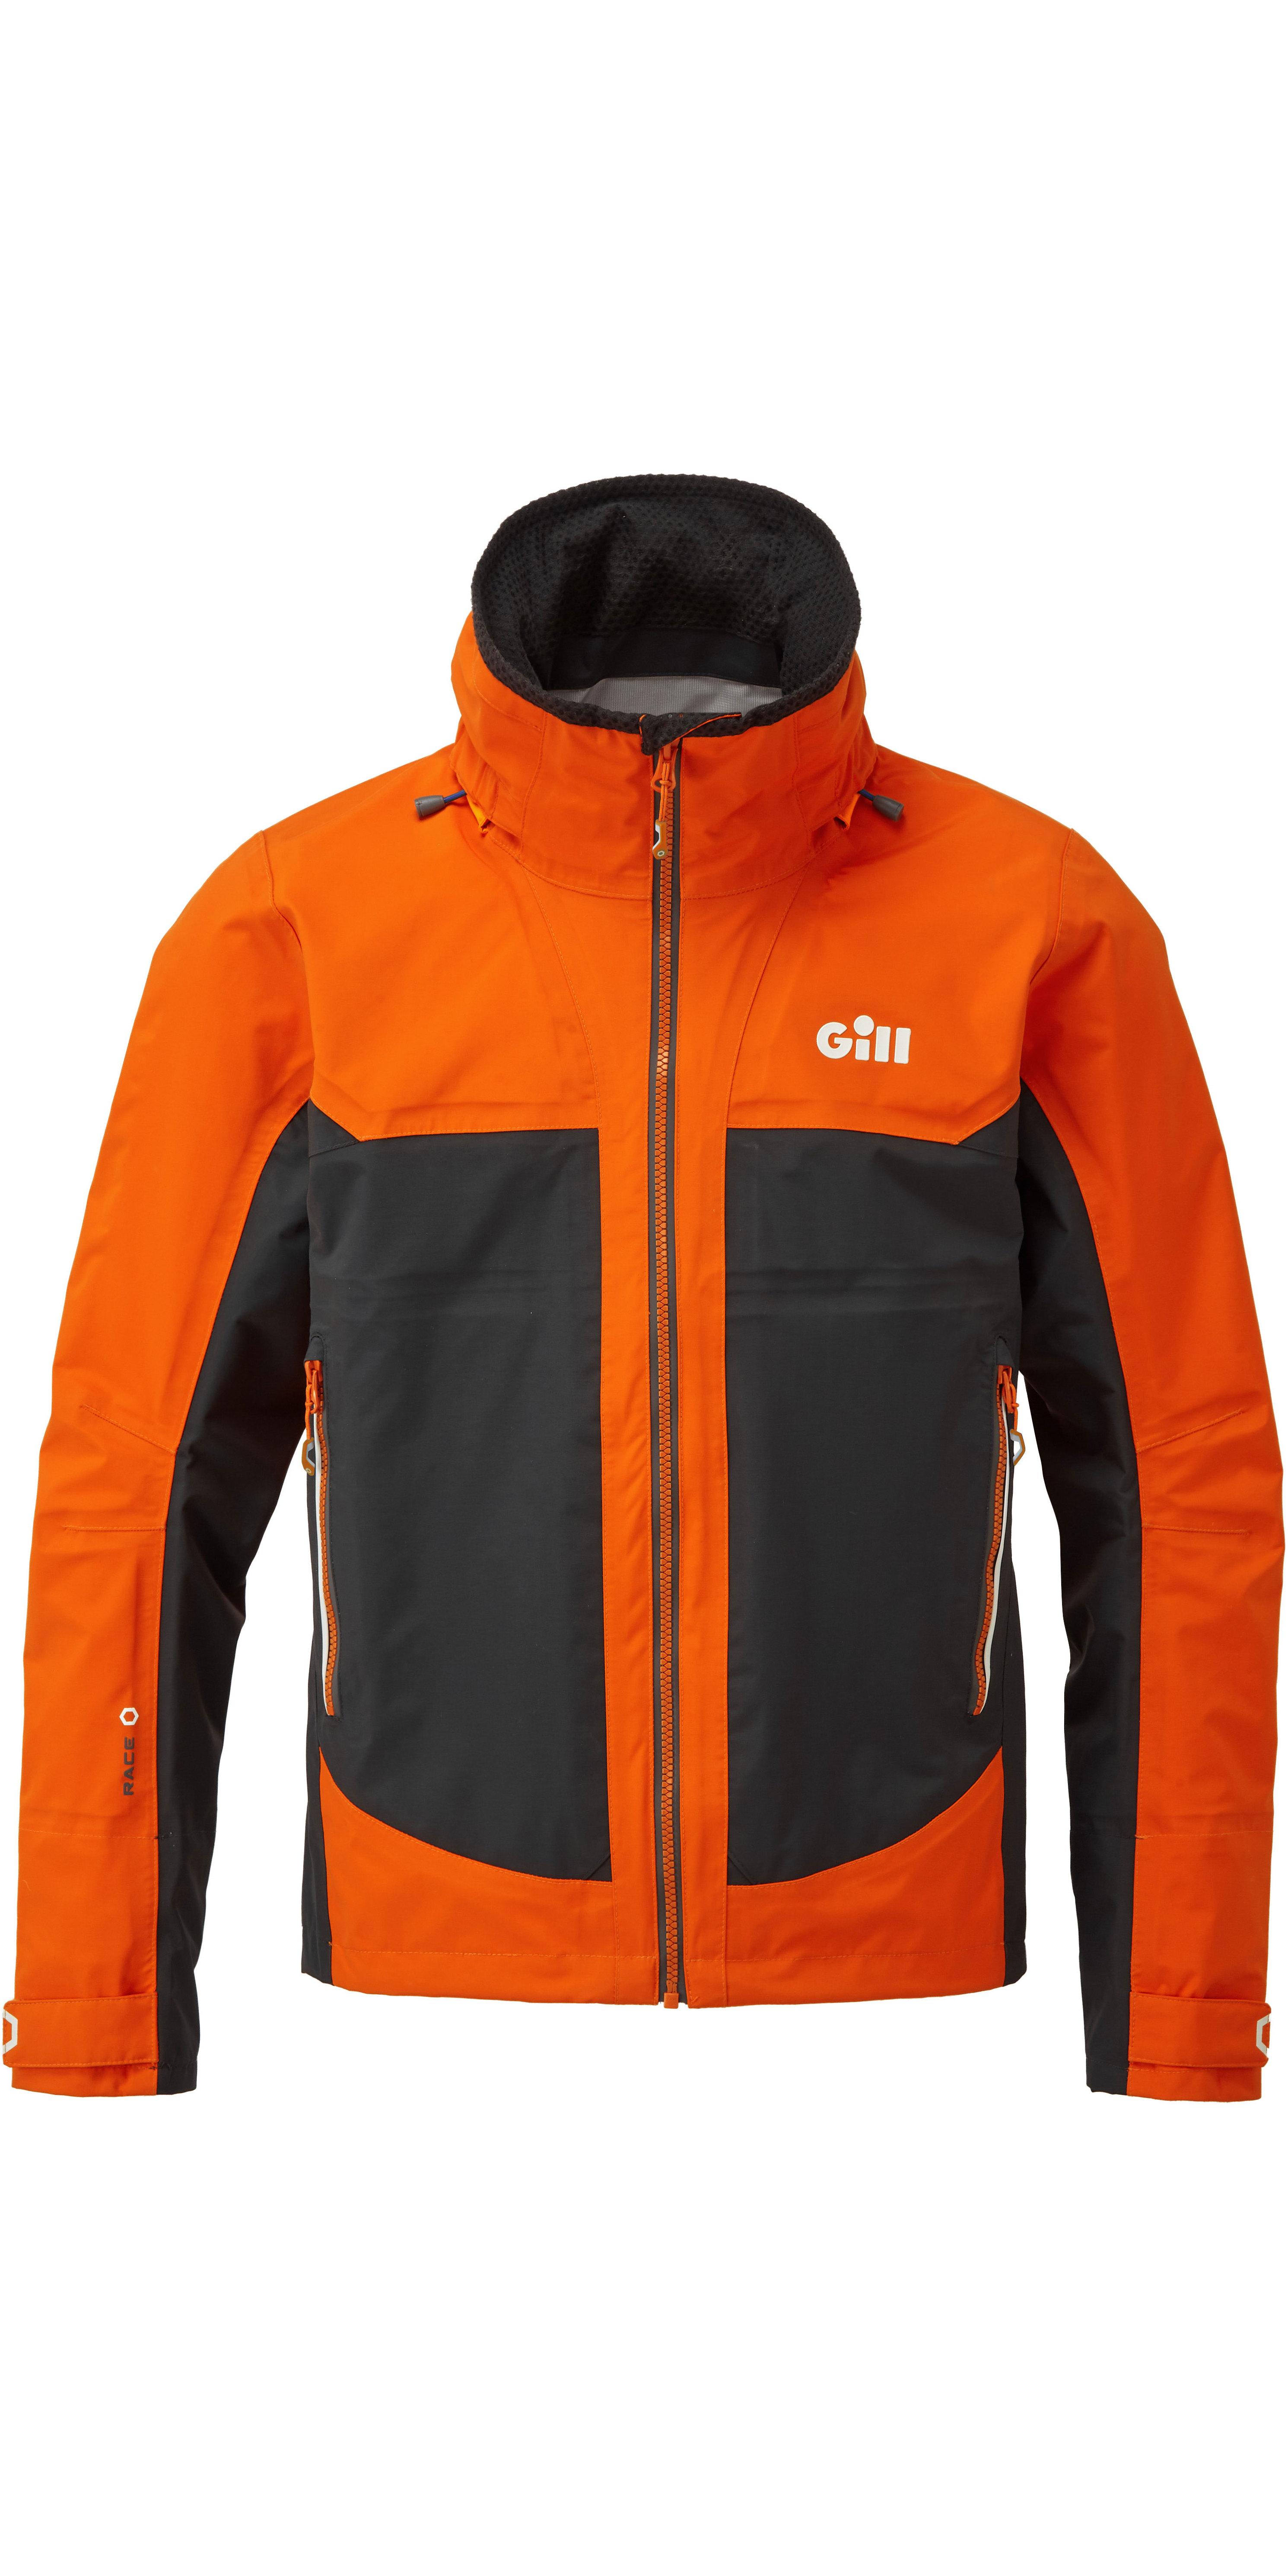 Graphit Gill Herren Uv Tec Pro Shorts 2019